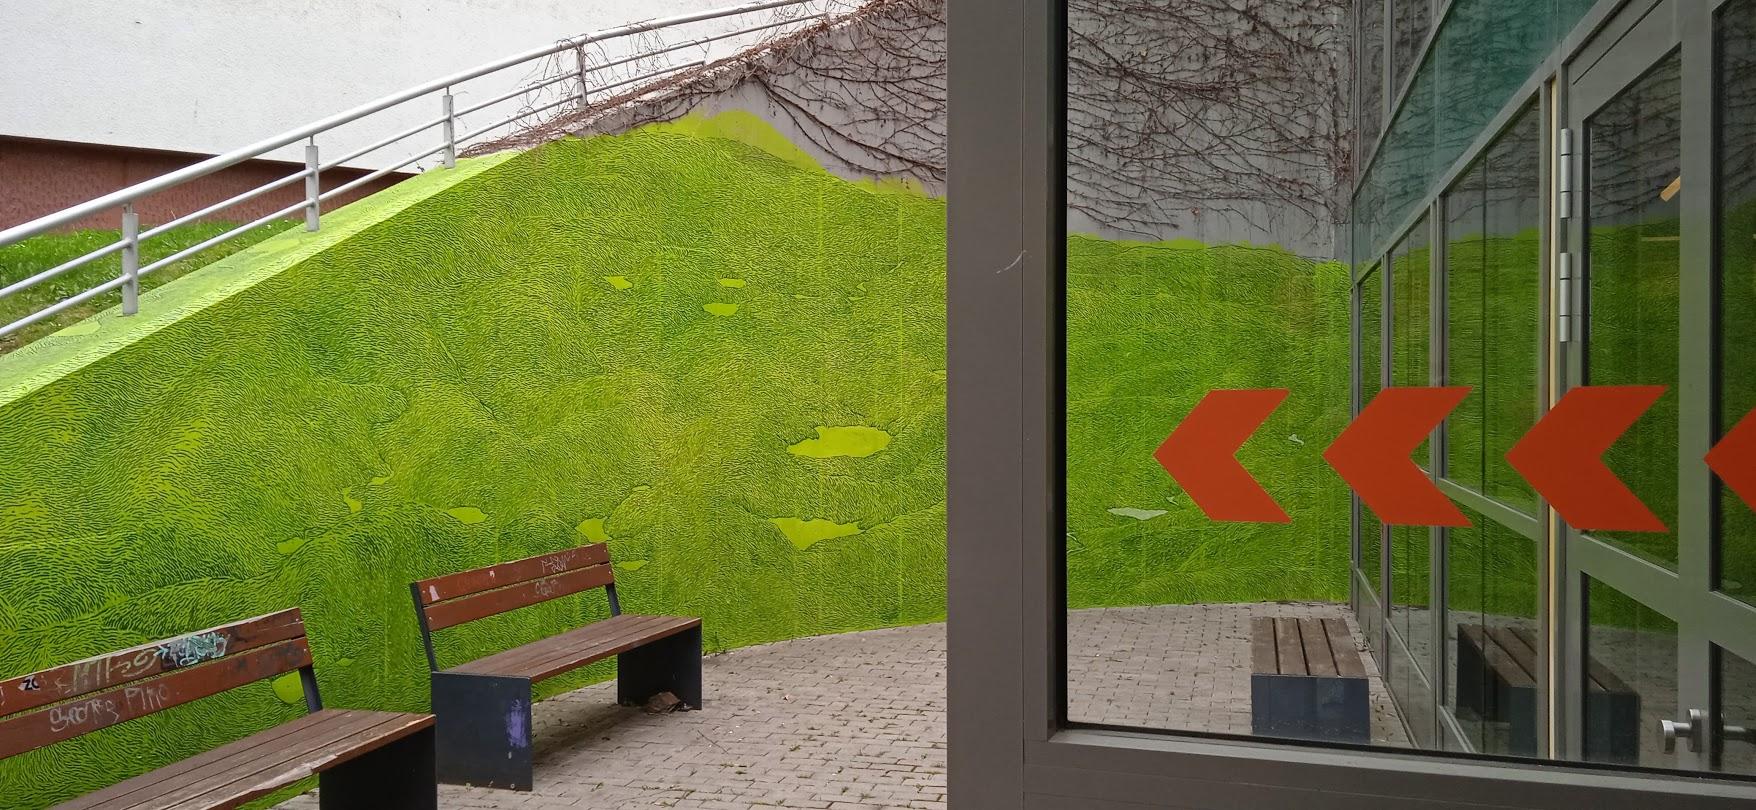 veronika zapletalova borislavka muralartum 2021 (33)